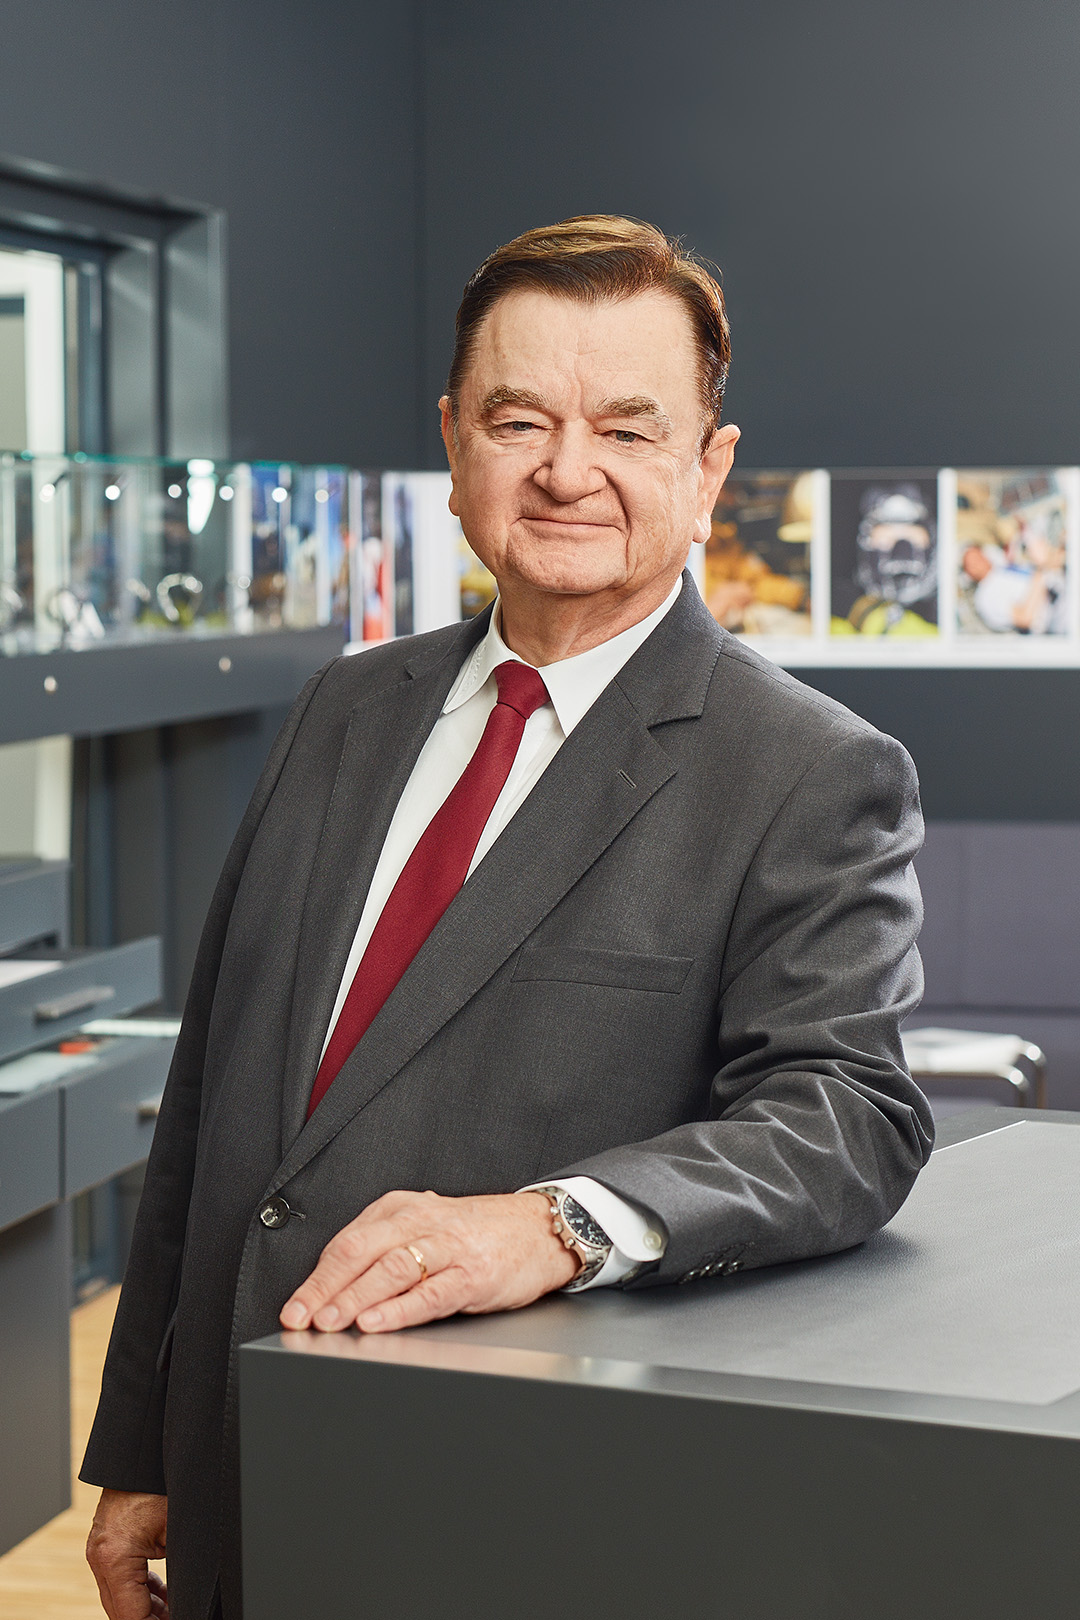 Uhrenpersönlichkeit Lothar Schmidt, Sinn Spezialuhren